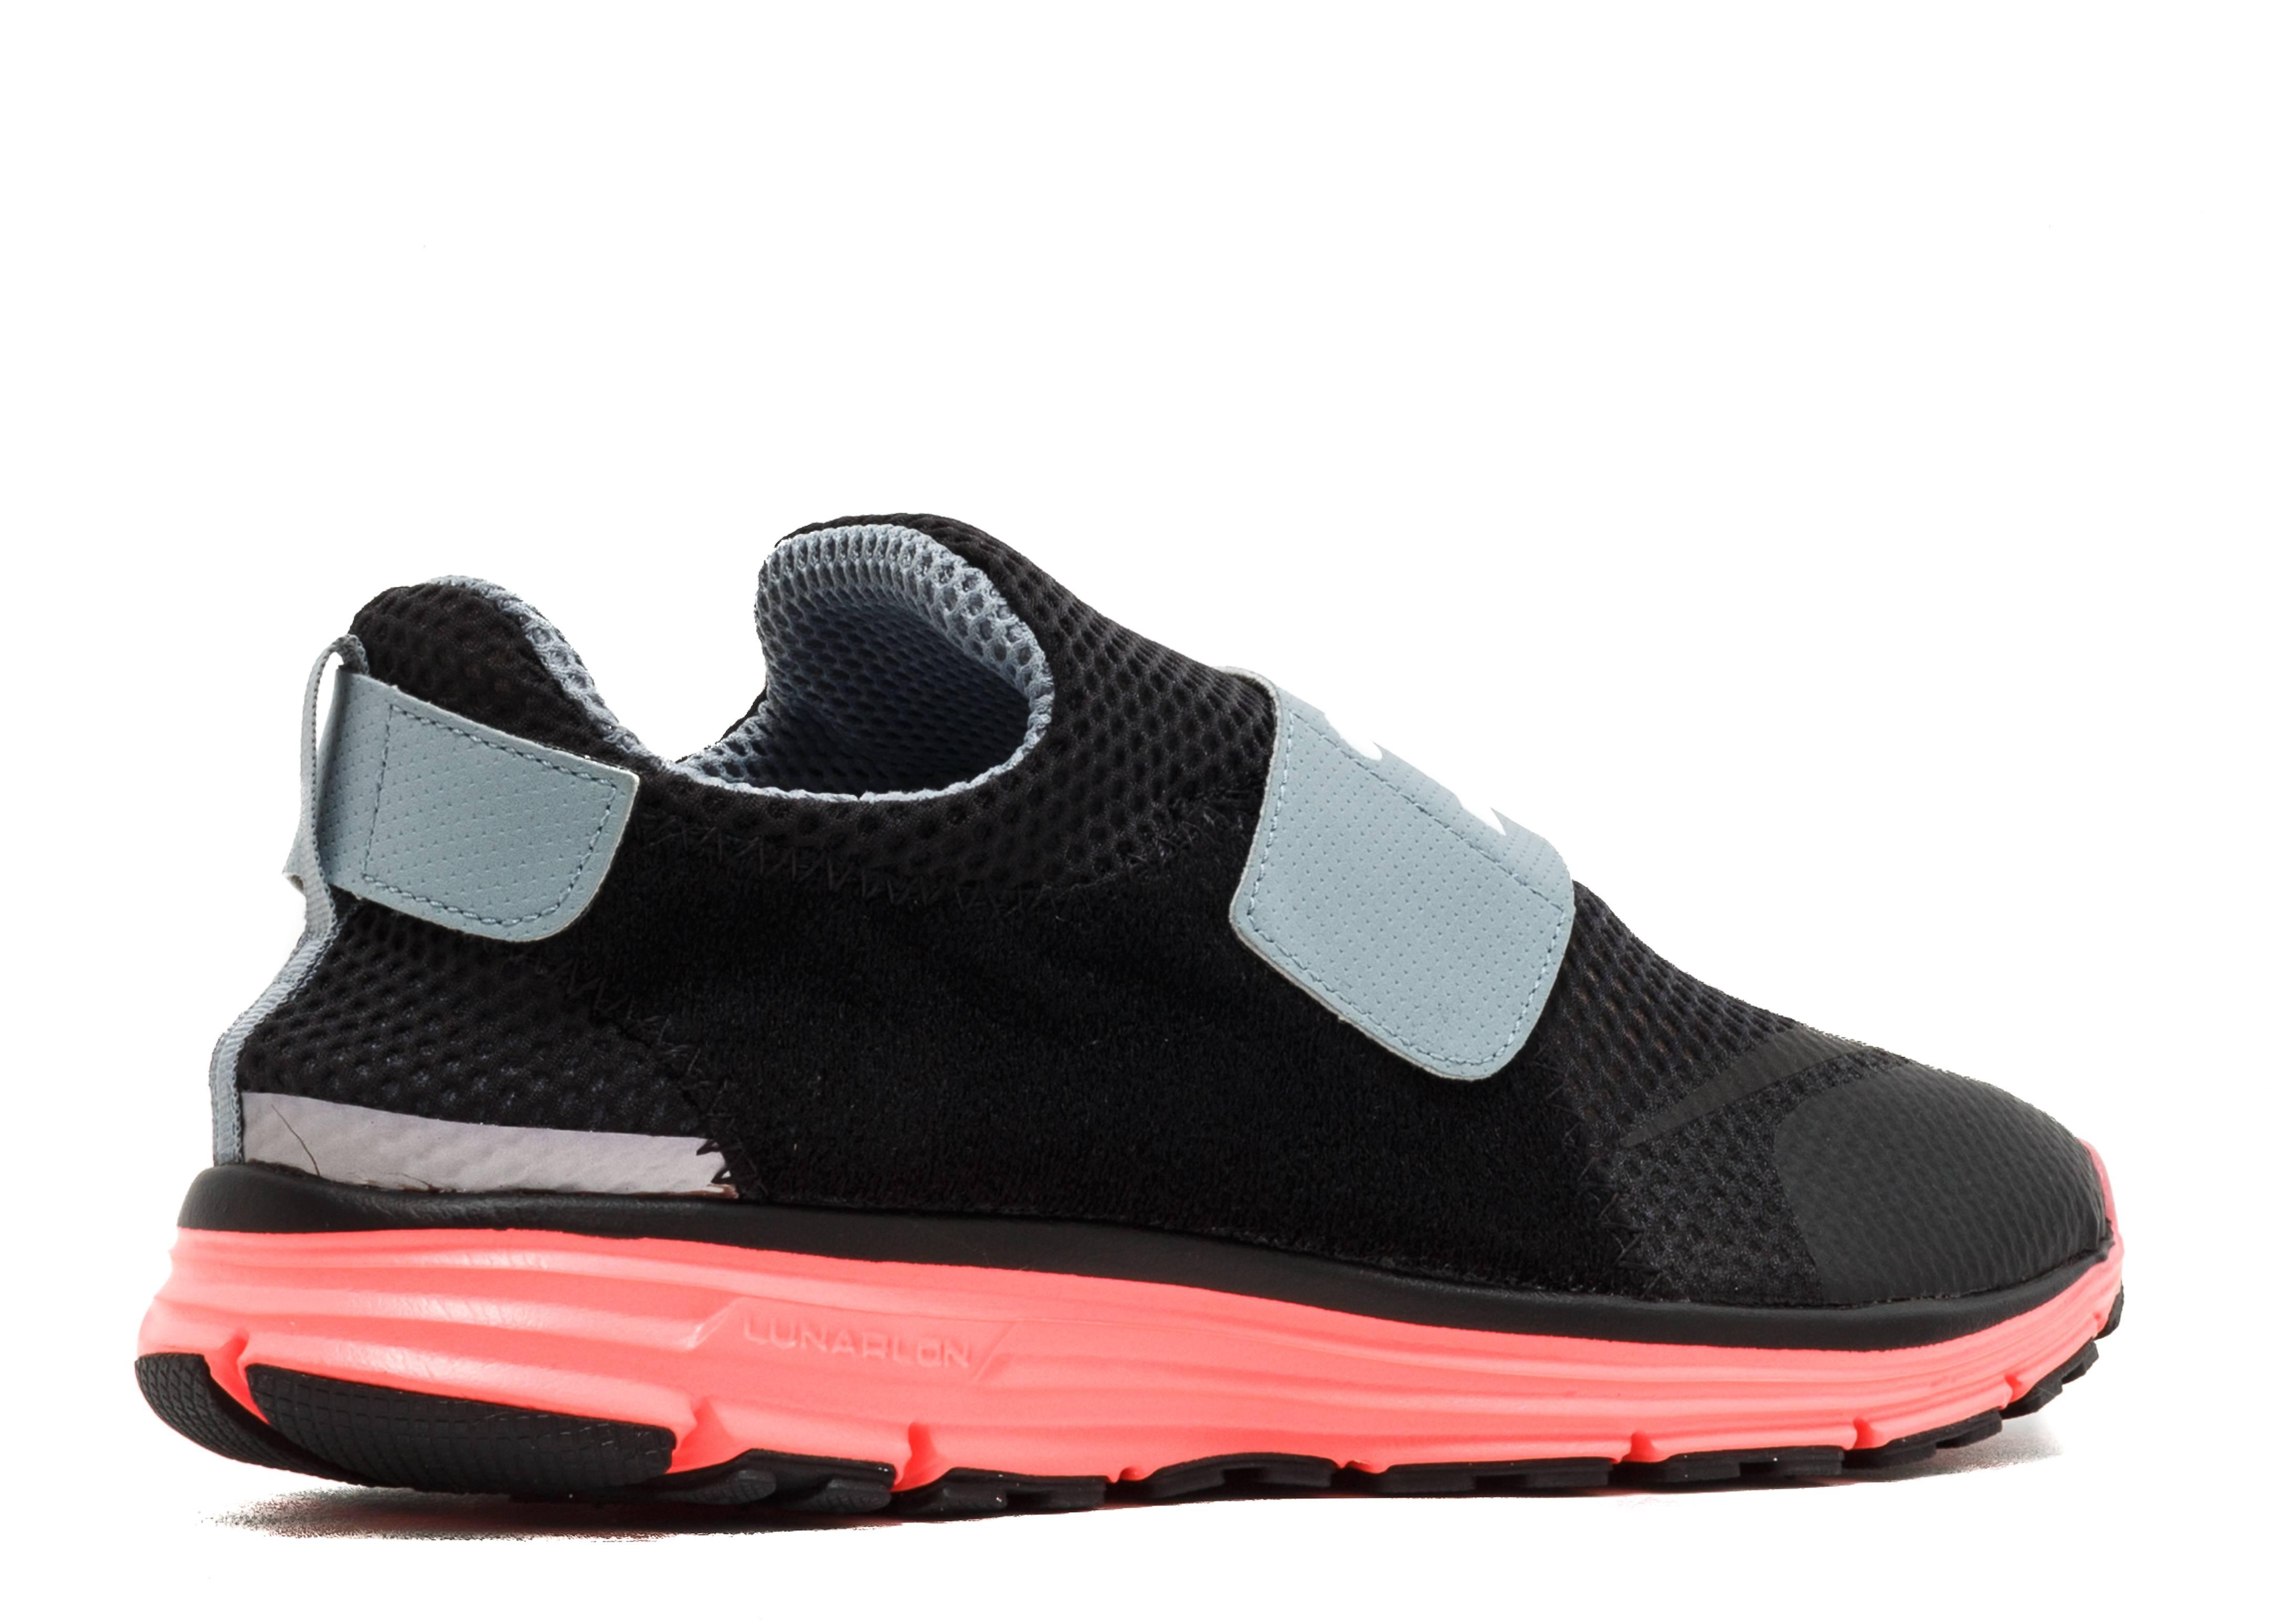 4b4dba9213c1e Nike Lunarfly 306 - Nike - 644395 002 - black white-mgnt gry-